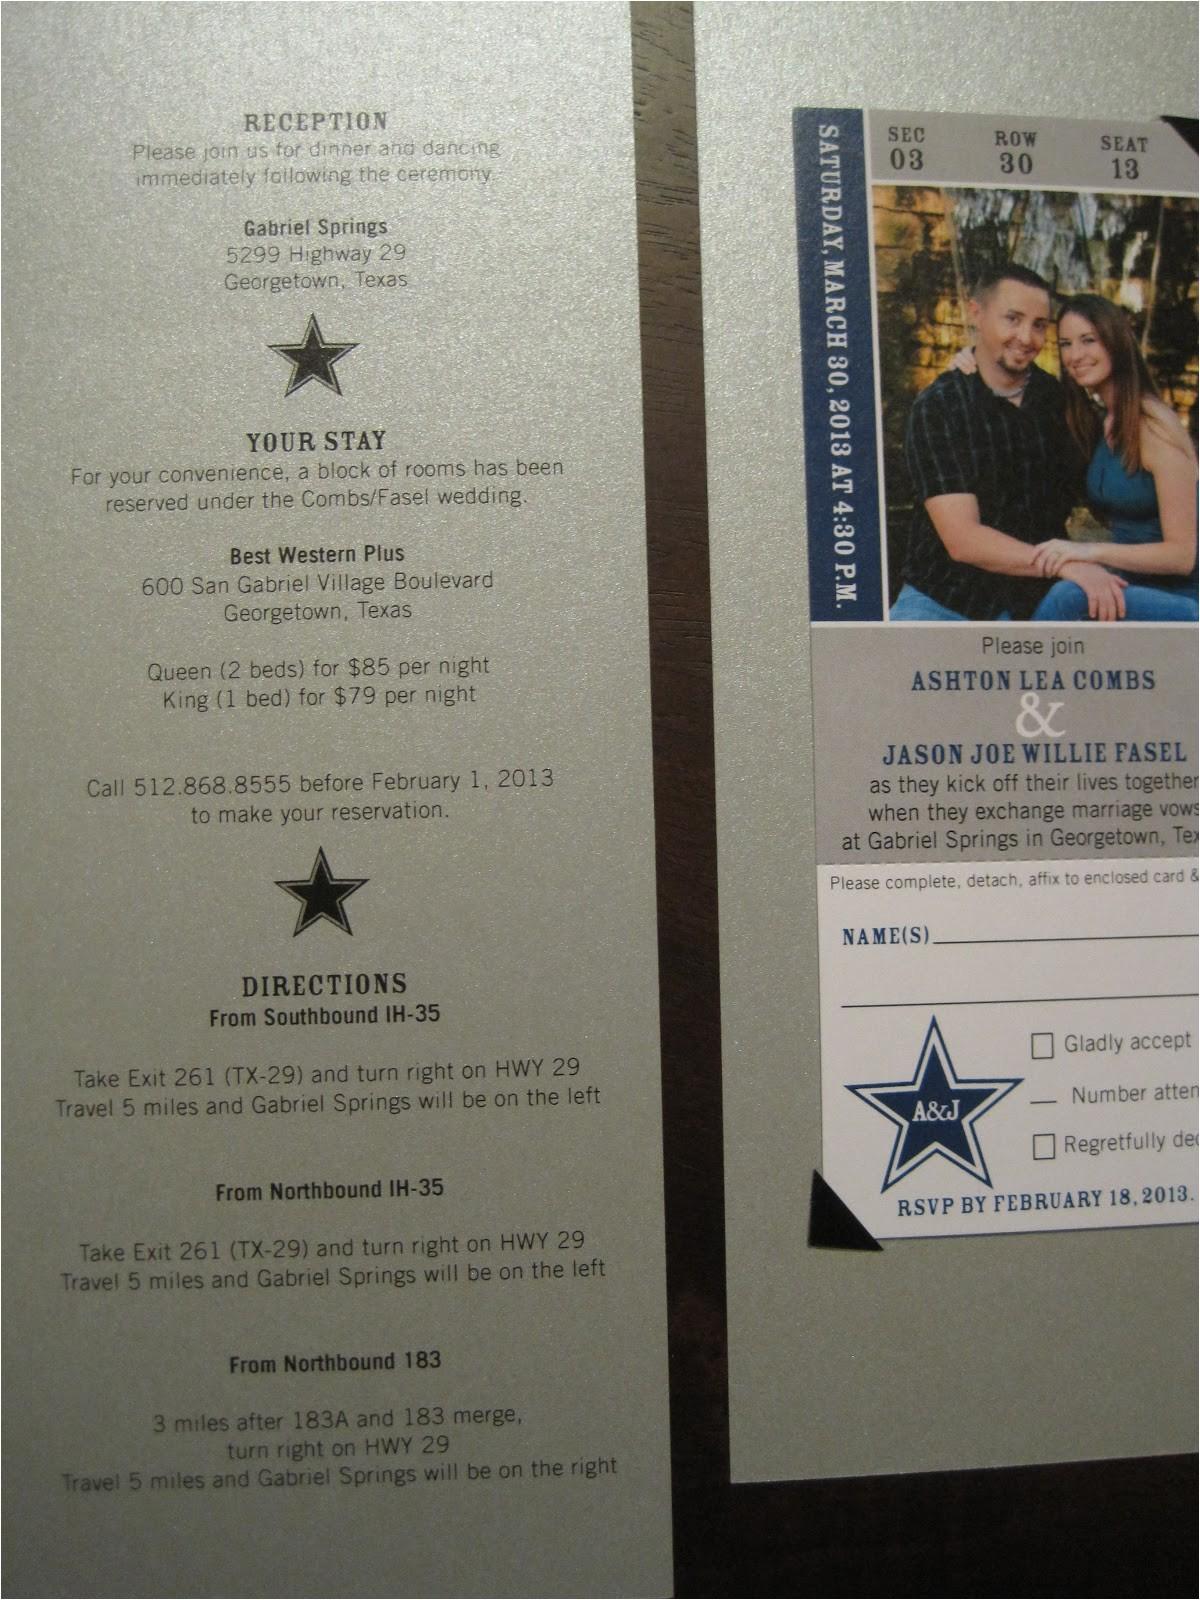 Wedding Invitations In Dallas Tx the Inviting Pear Photoblog Cowboys Ticket as Wedding